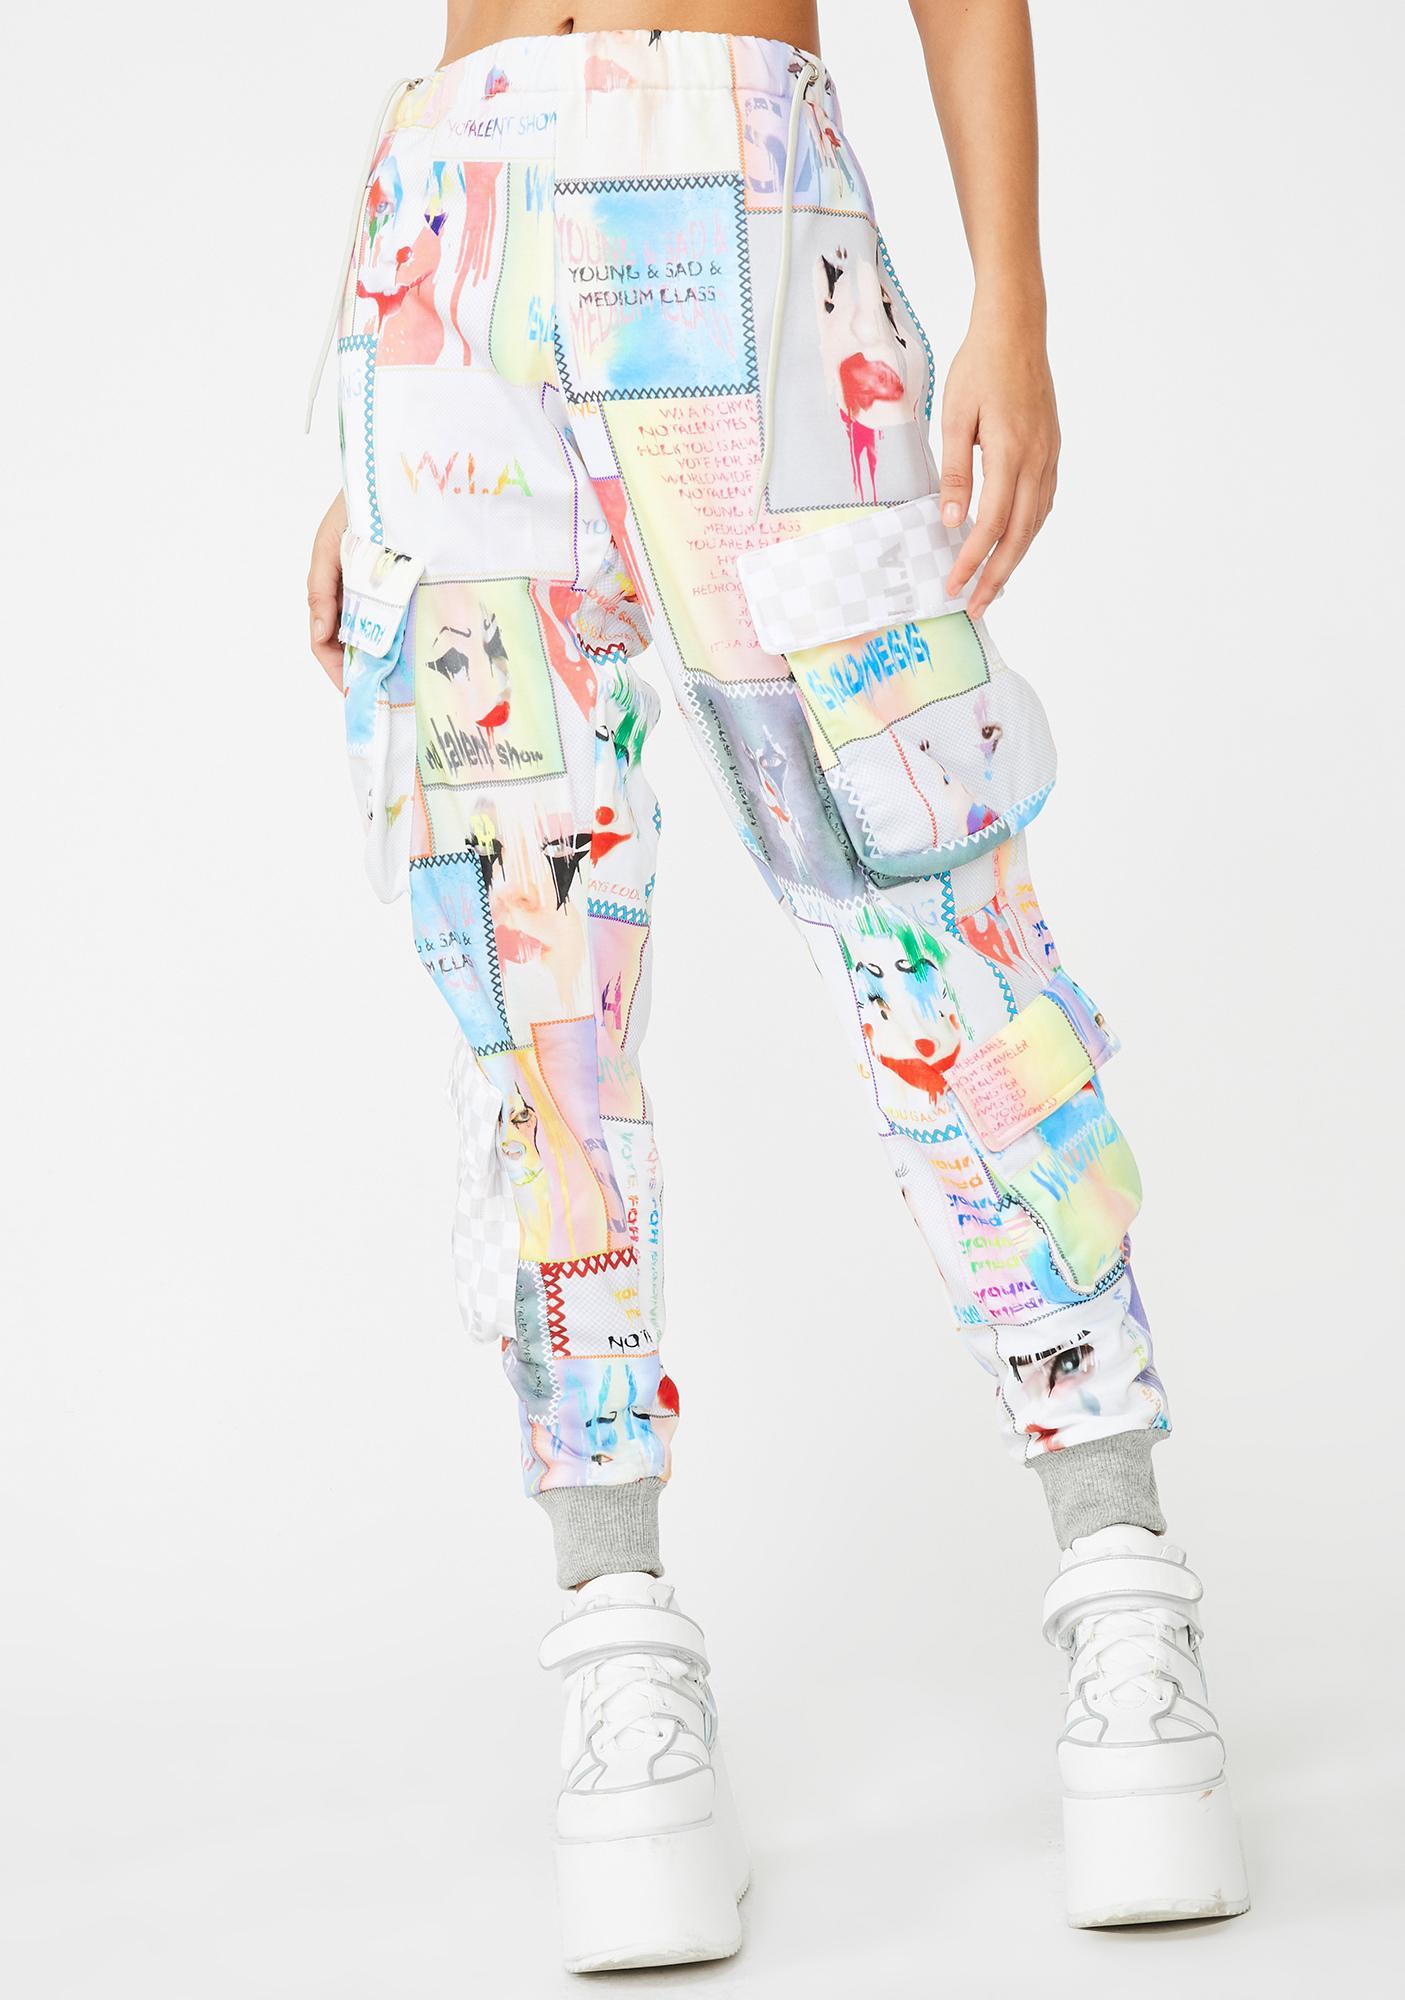 W.I.A Bag Cargo Pants